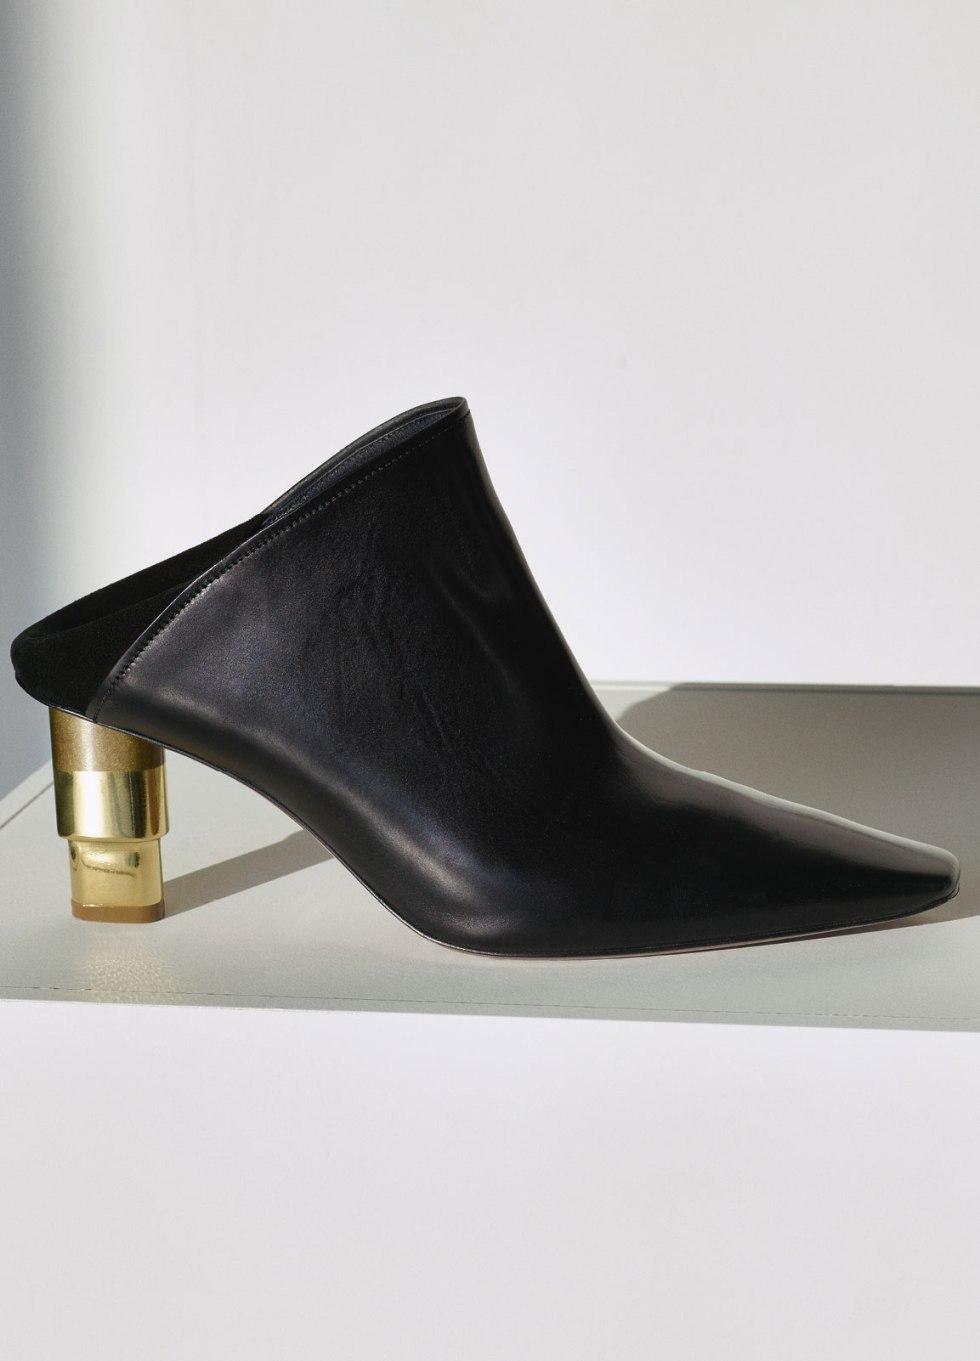 celine-mule-candle-heel-shoes